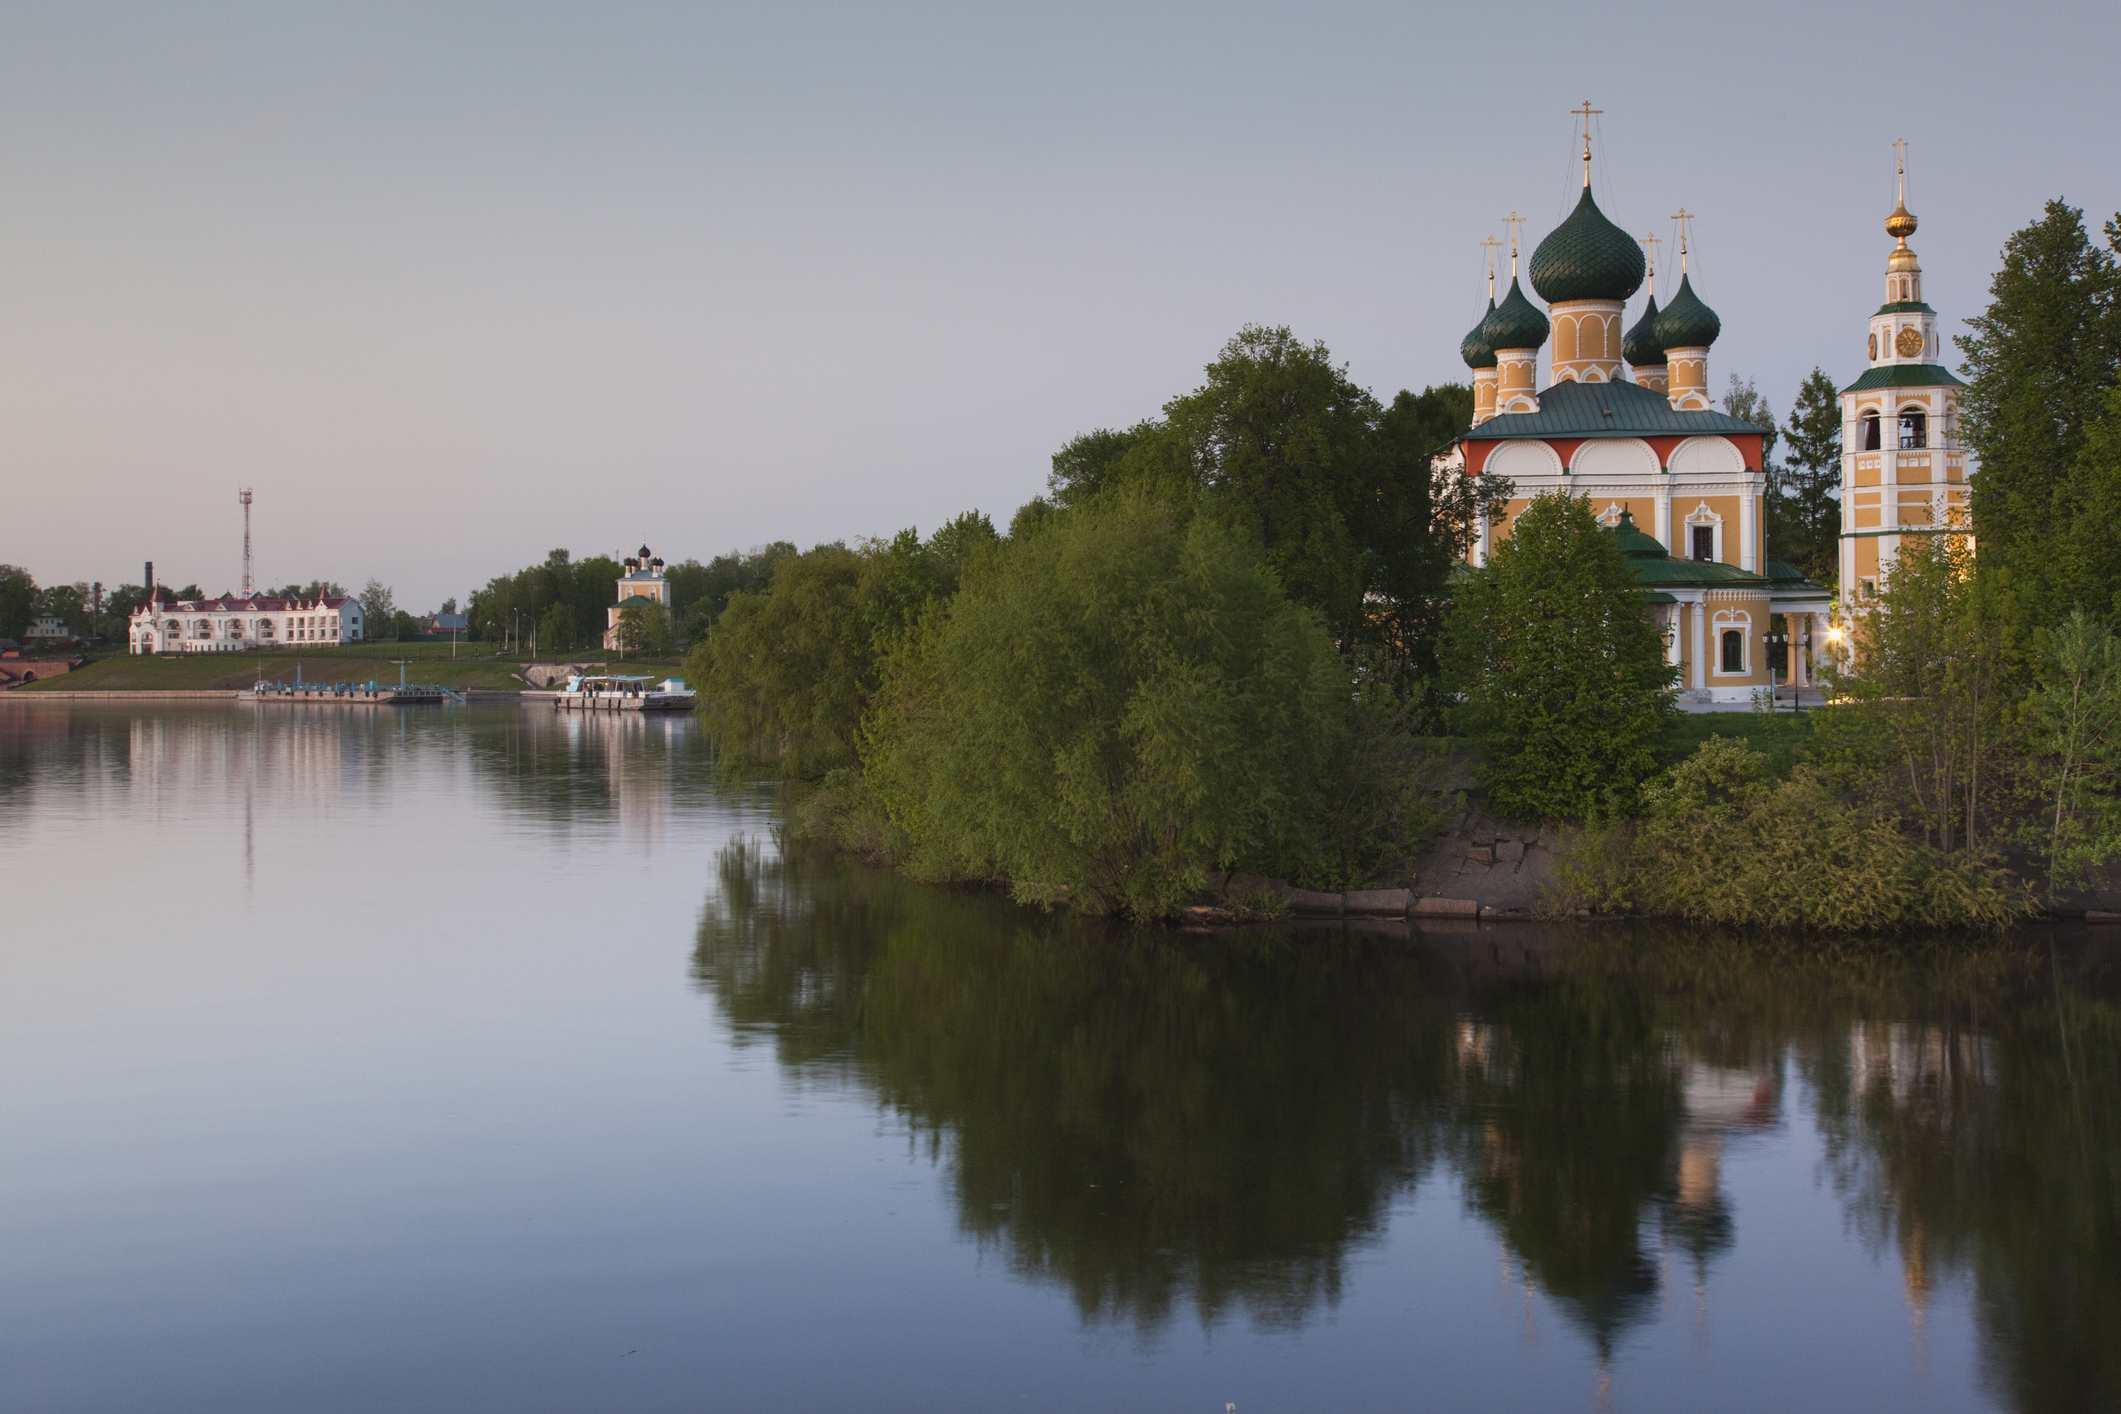 Russia, Yaroslavl Oblast, Golden Ring, Uglich